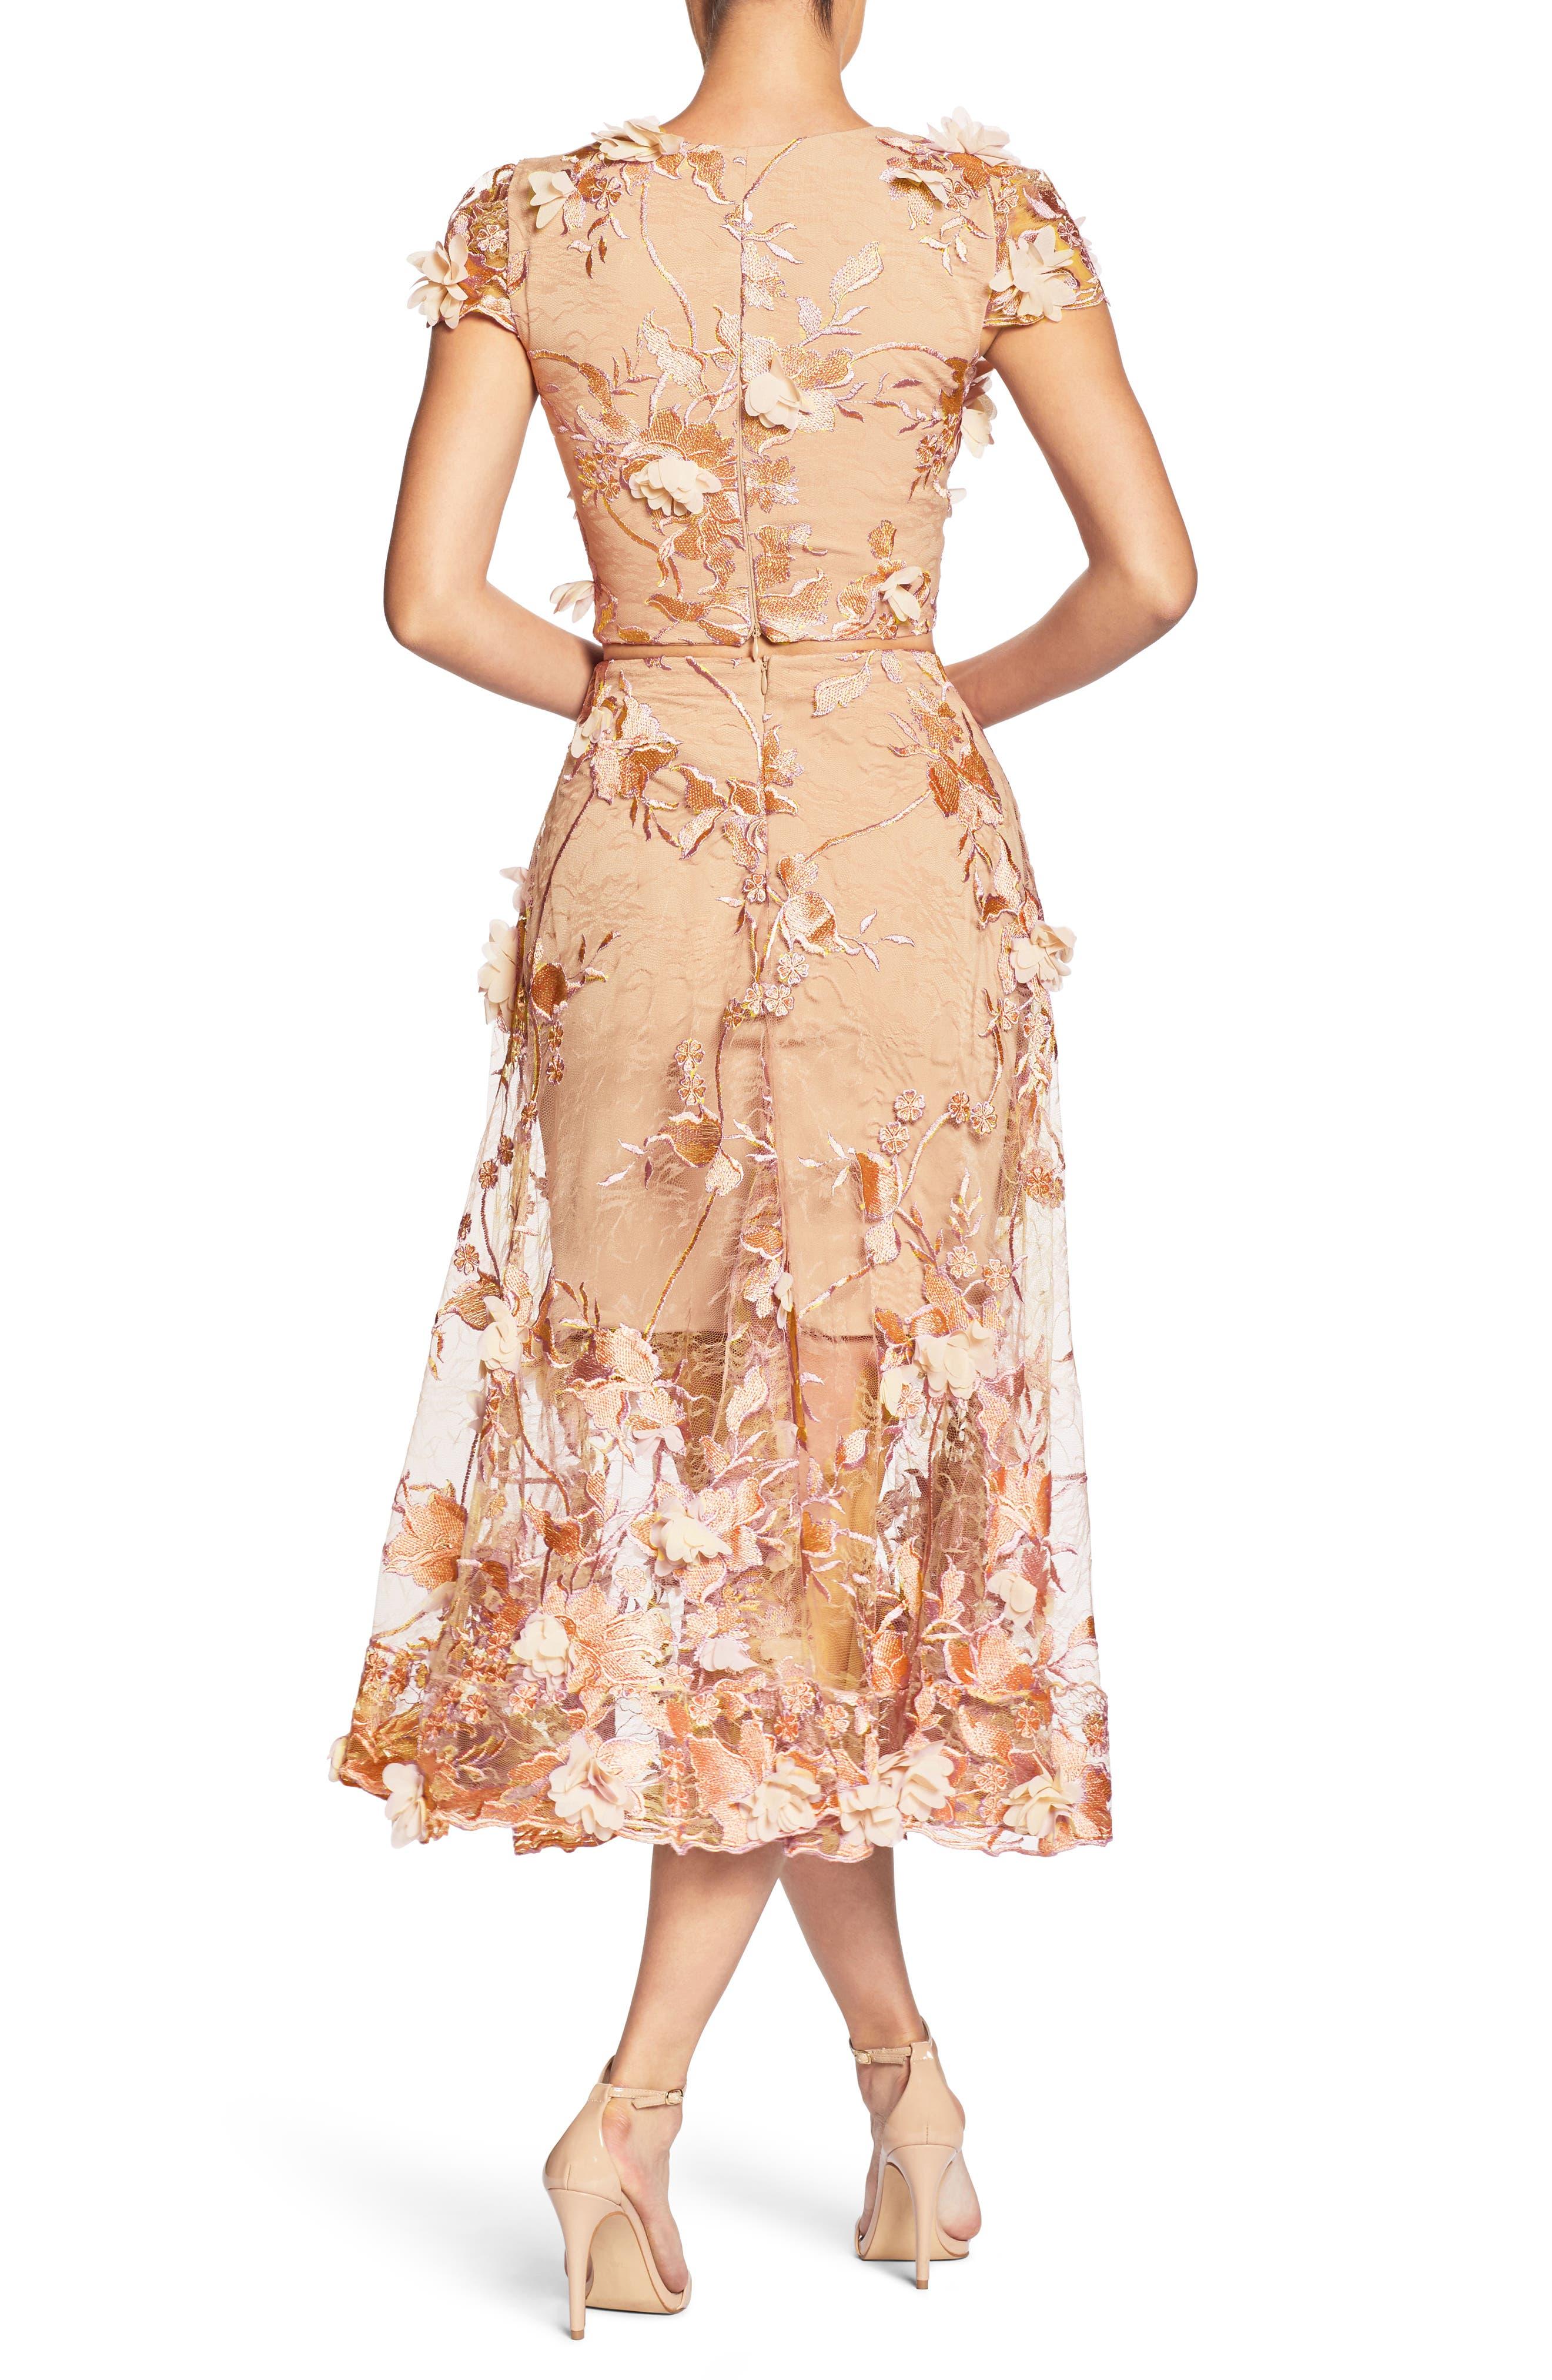 Juliana 3D Lace Two-Piece Dress,                             Alternate thumbnail 2, color,                             Peach